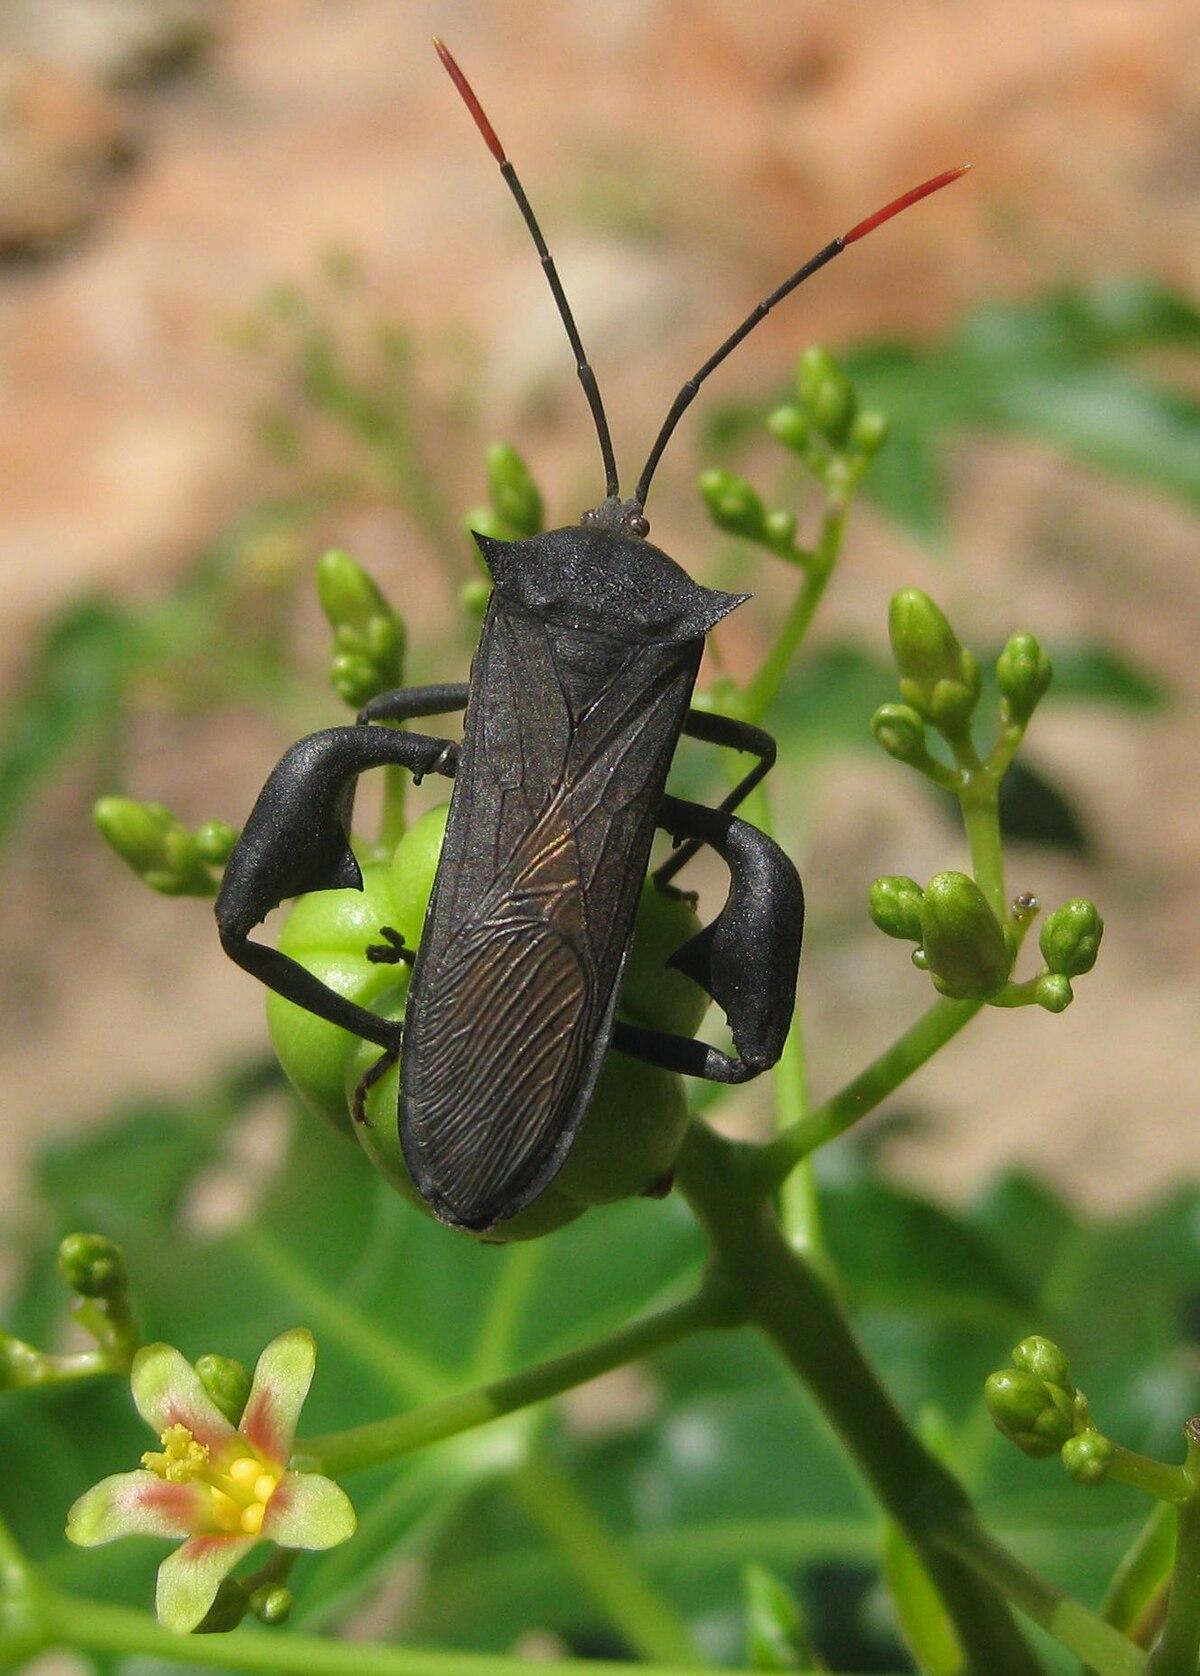 Coreidae - Wikipedia